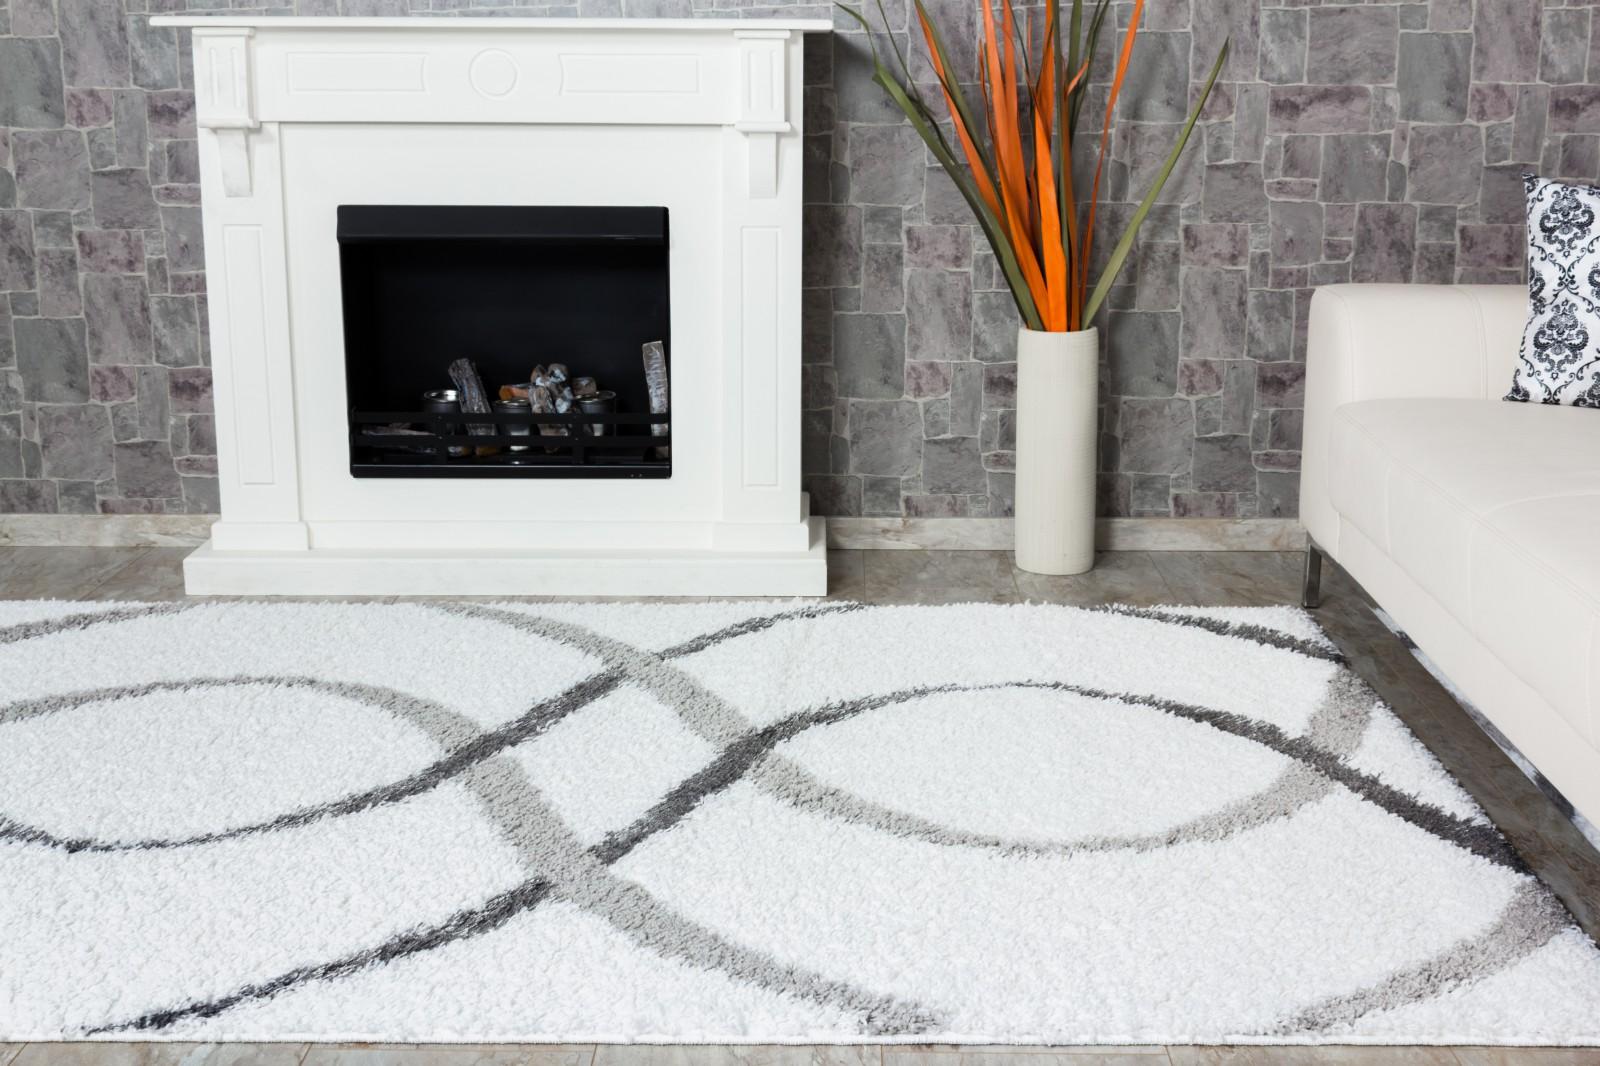 teppich shaggy portofino hochflor teppich modern 133x190 cm wei grau. Black Bedroom Furniture Sets. Home Design Ideas